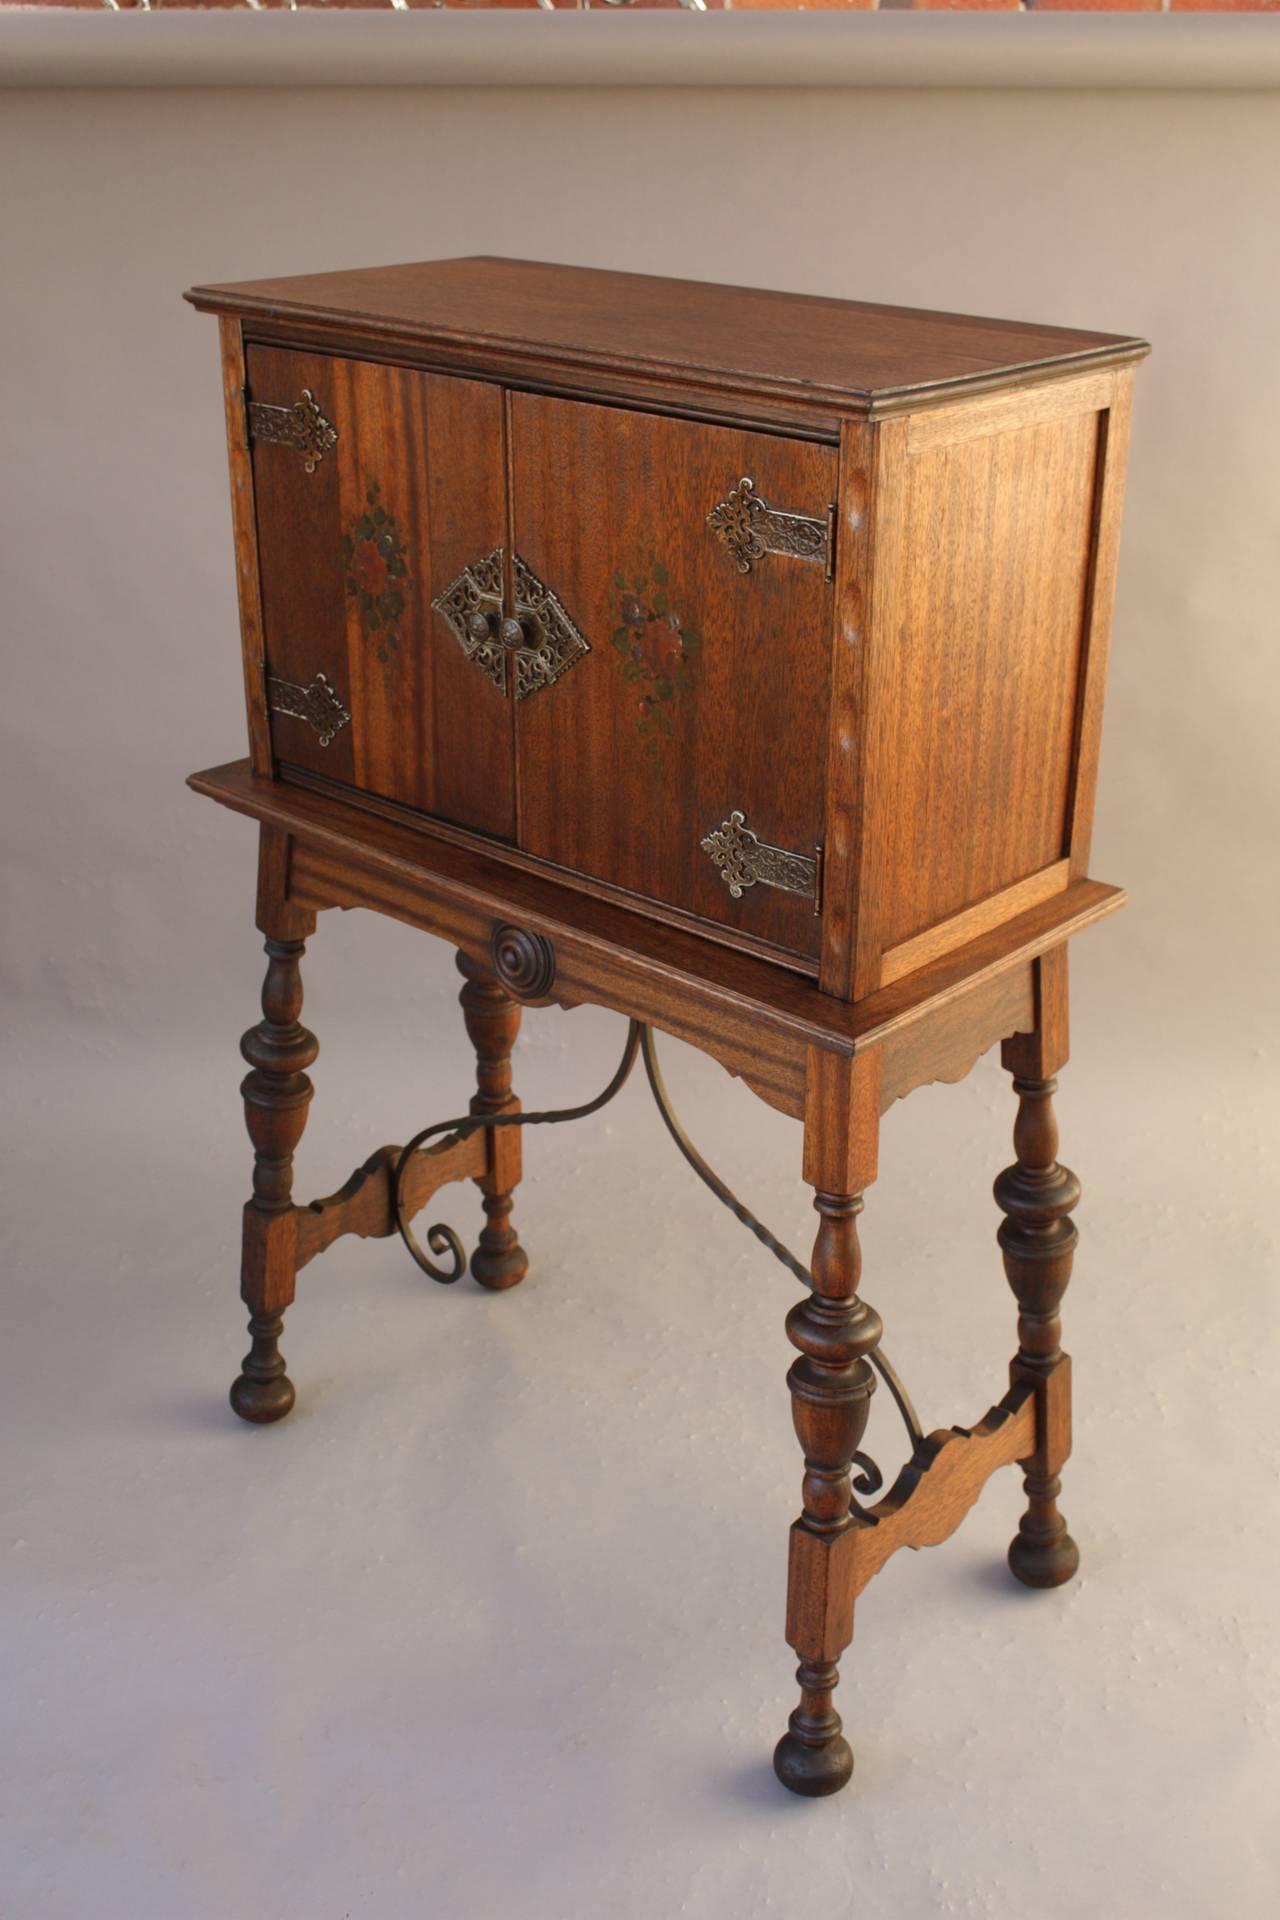 Spanish Revival Vargueno Desk at 1stdibs